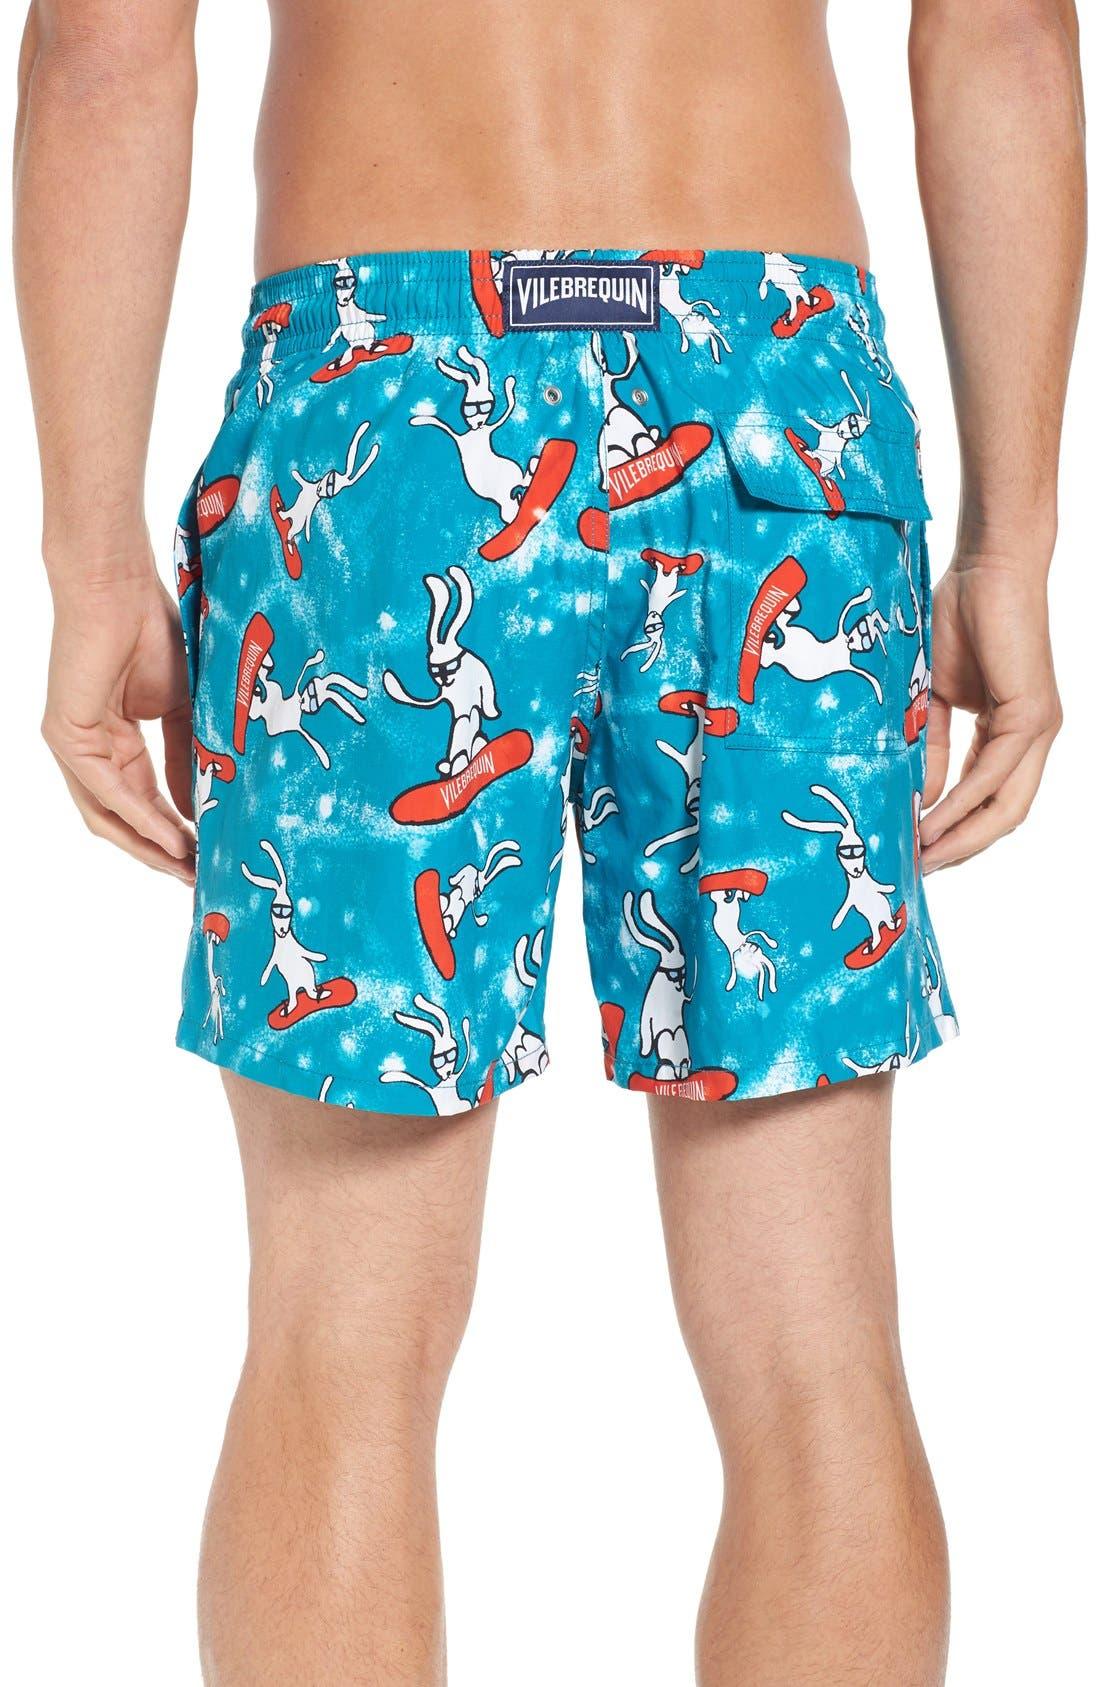 Snowboard Bunnies Print Swim Trunks,                             Alternate thumbnail 2, color,                             Prussian Blue